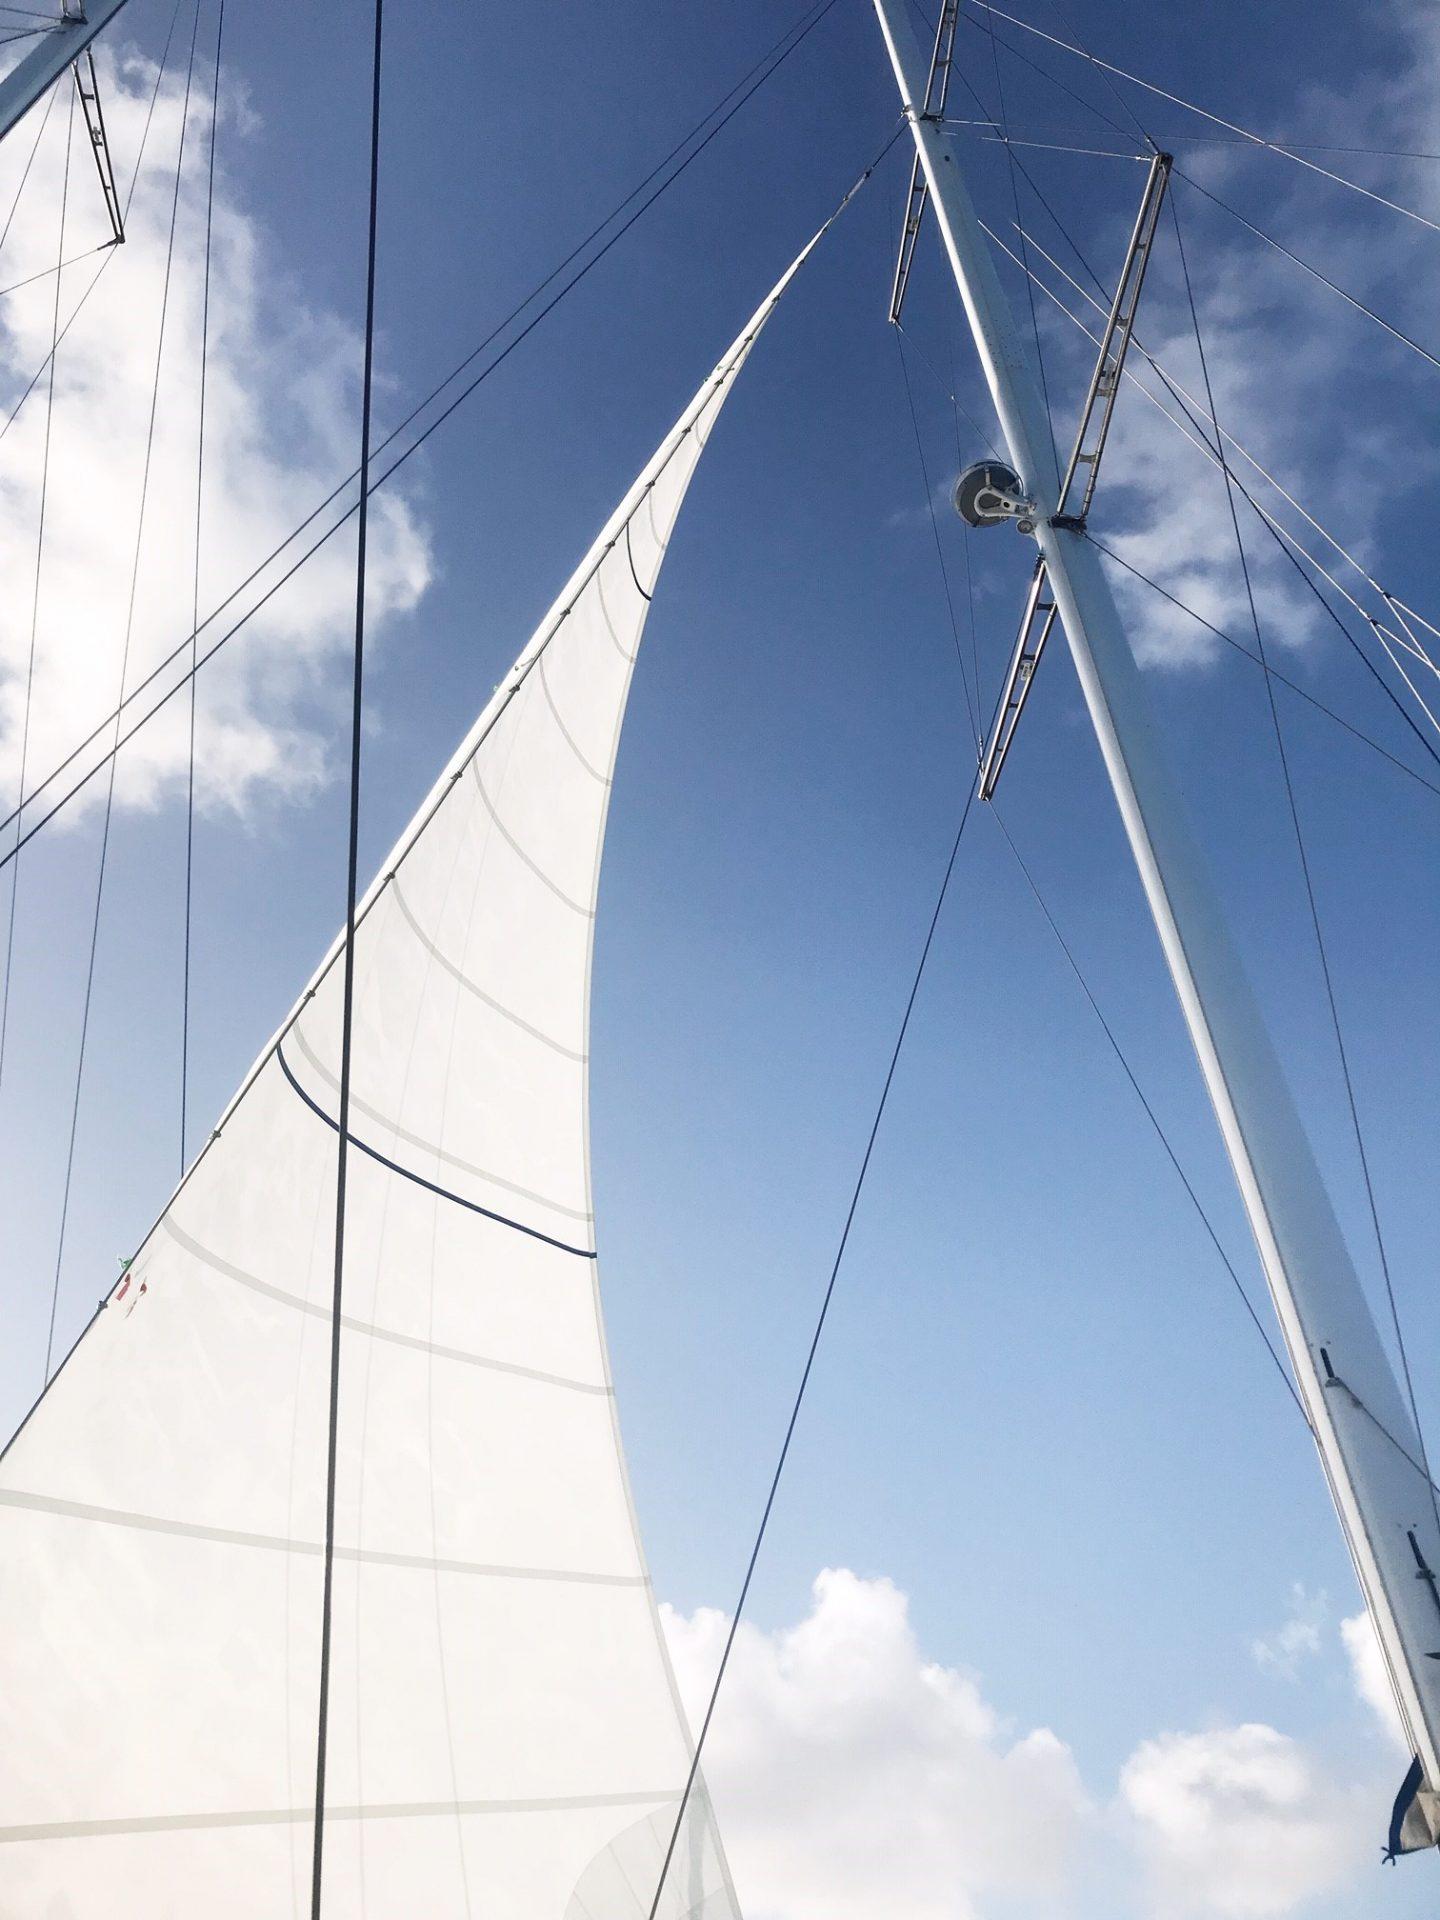 BVI Sailing - Sails up on Cuan Law